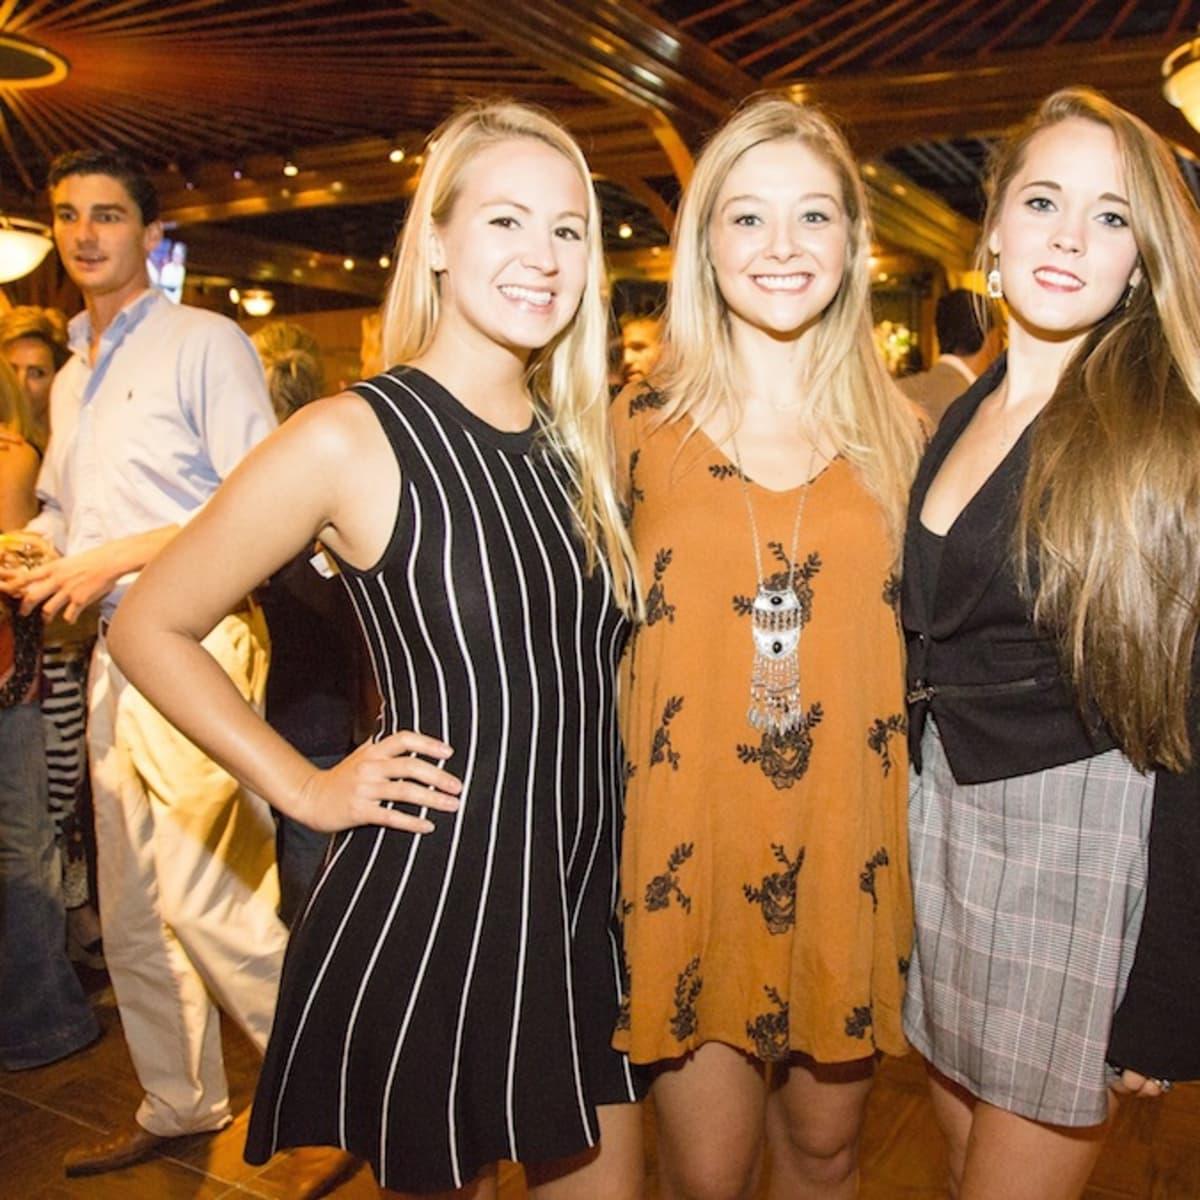 News, Shelby, Beth Muecke b'day, Oct. 2015,  Kendra Muecke, Nicole Lazarz, Samantha Evans